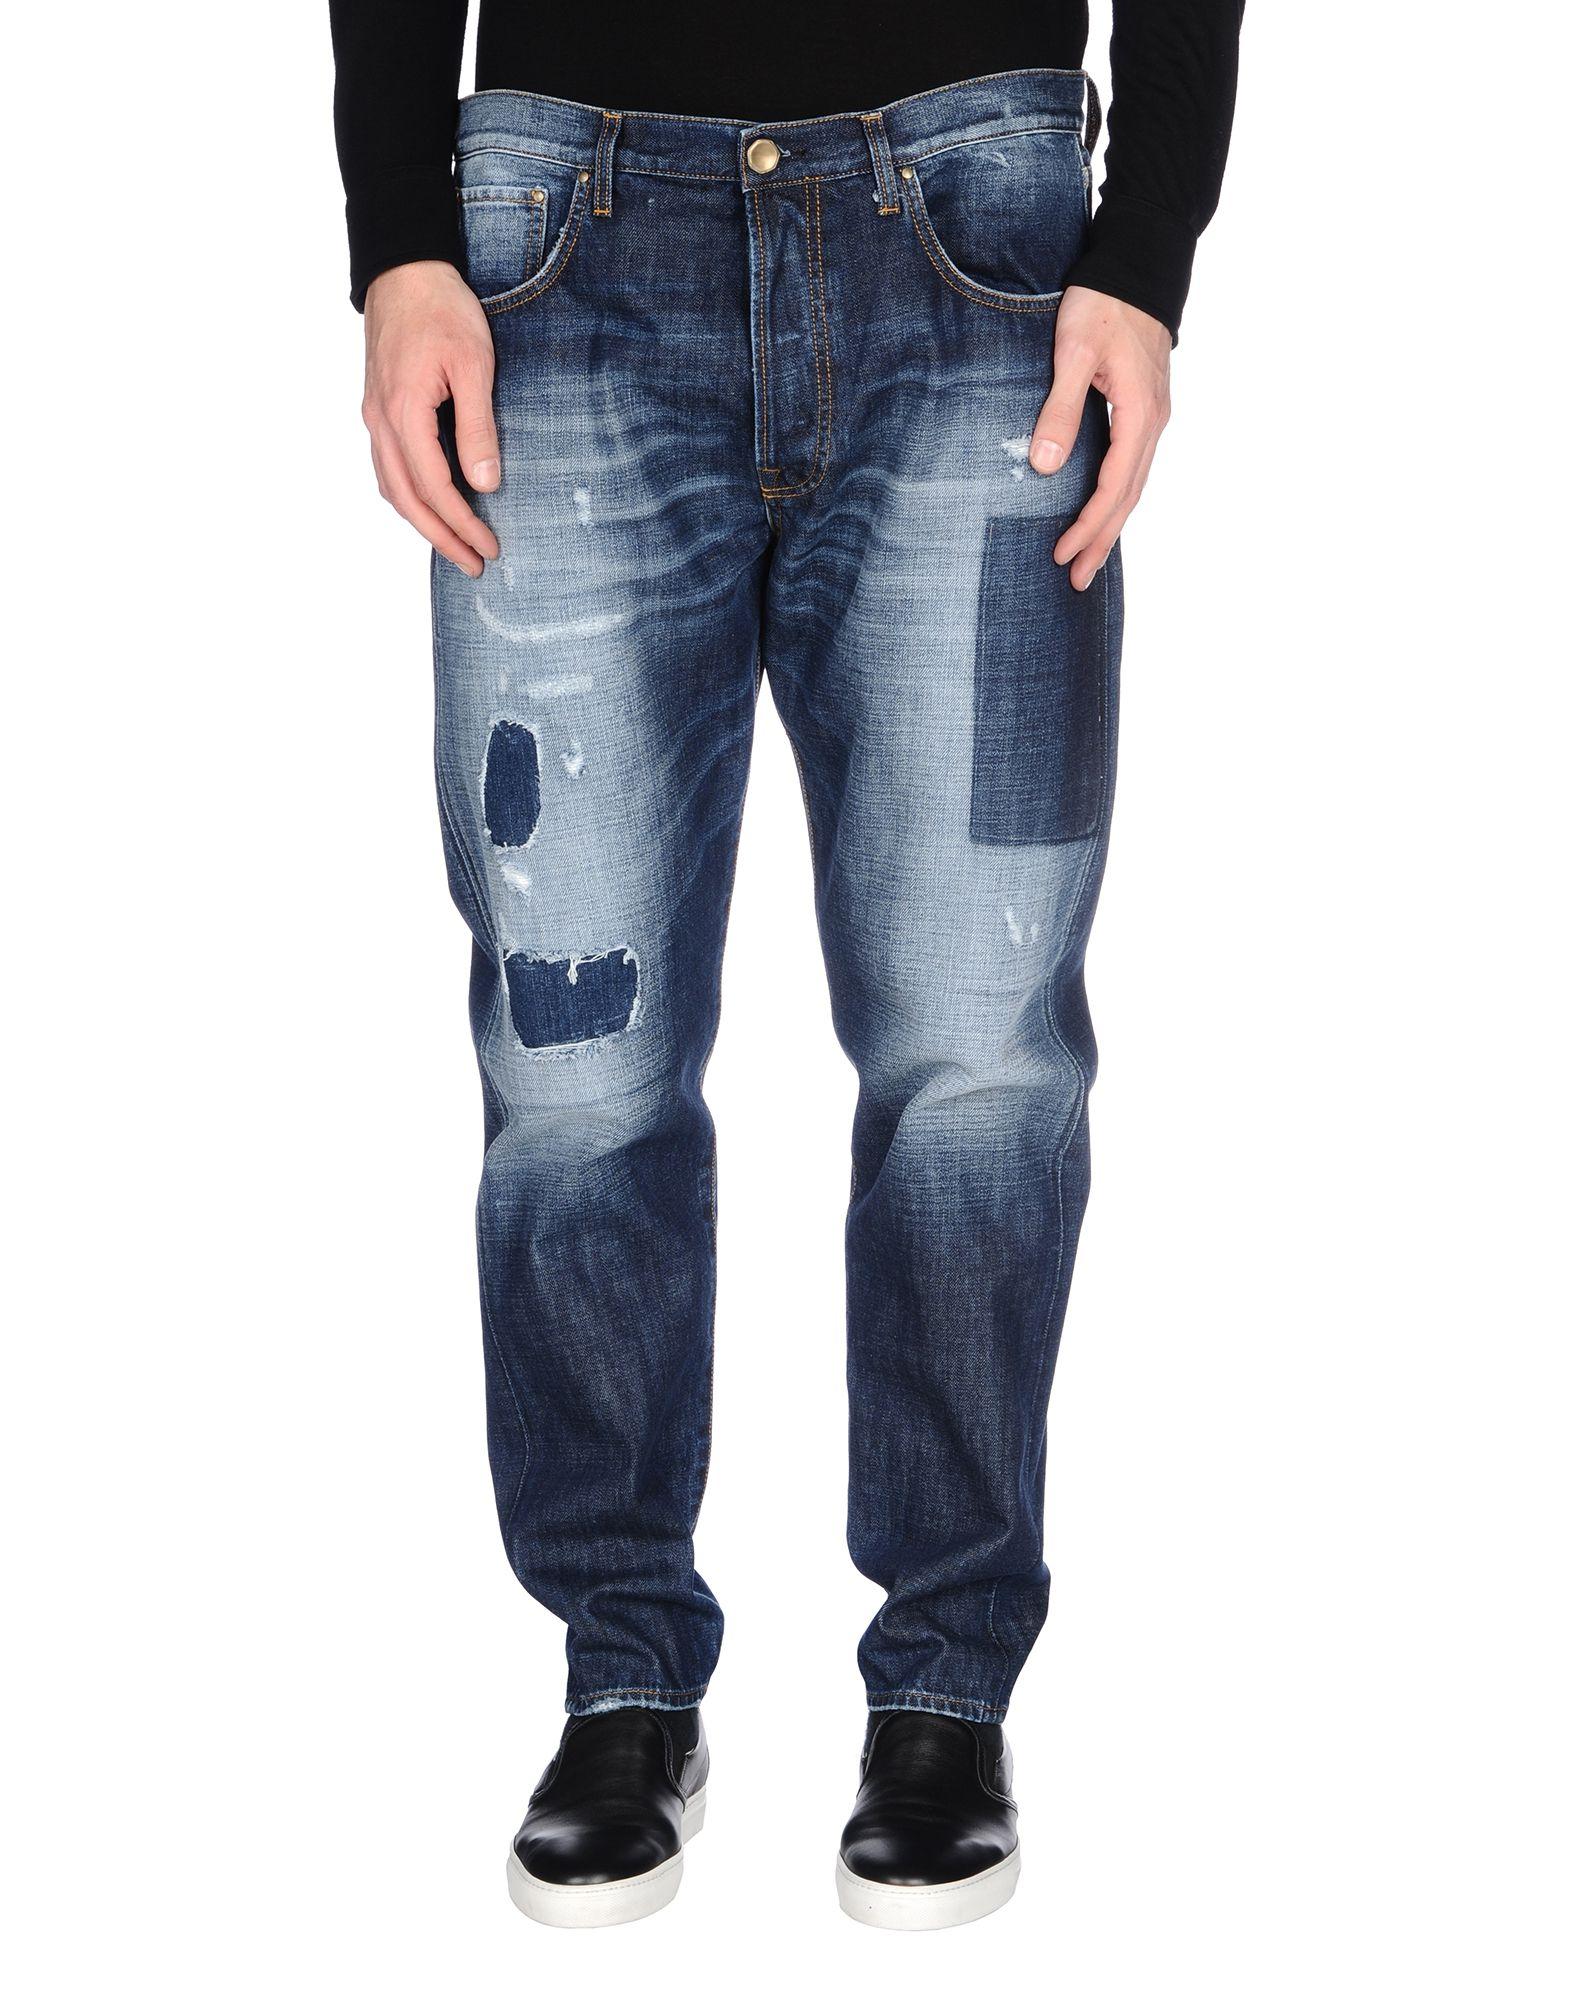 Pantaloni Jeans Aglini Uomo - - - 42499135GE 212352